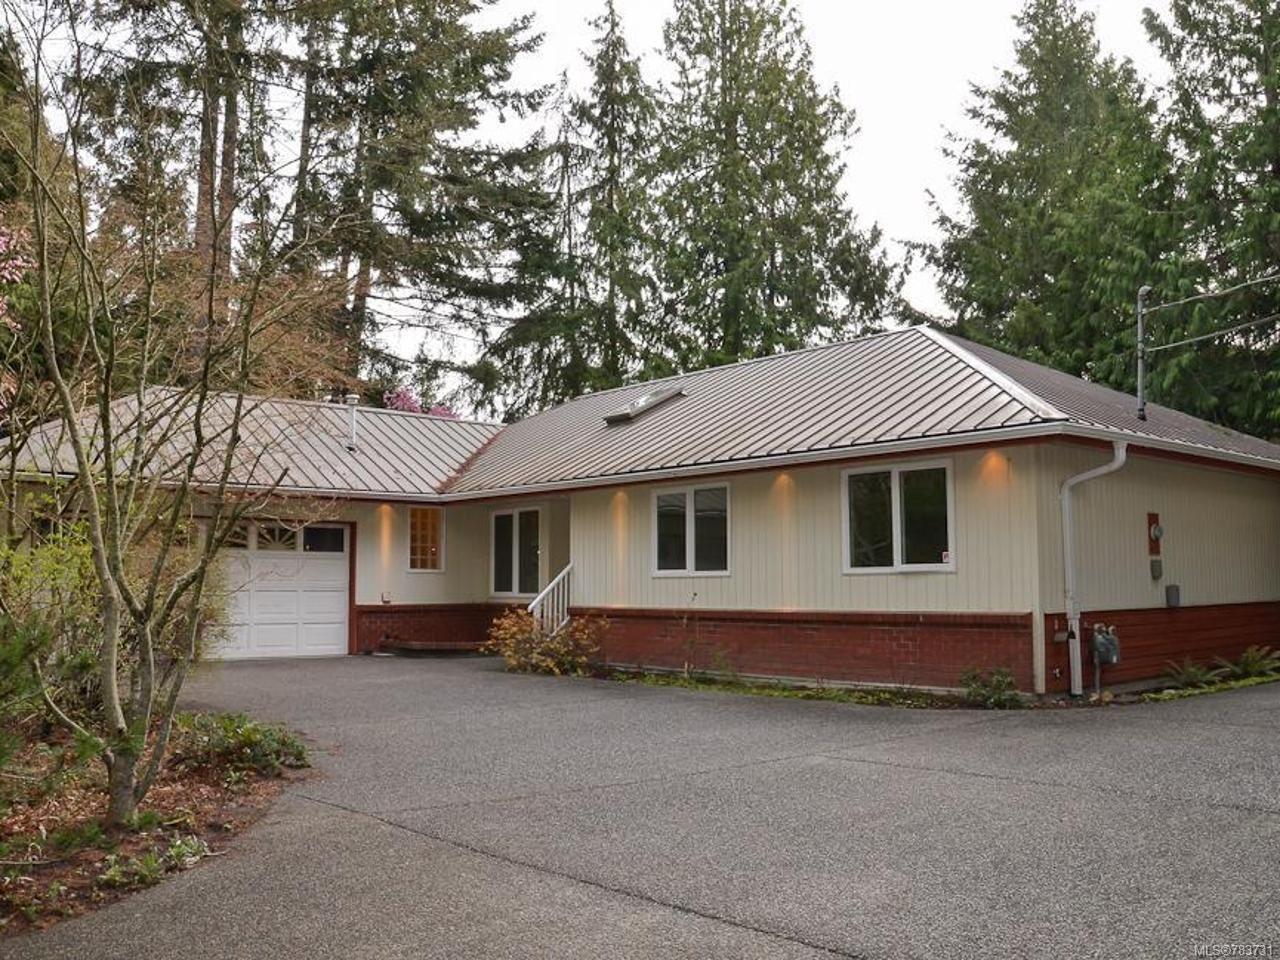 Main Photo: 780 Terrien Way in PARKSVILLE: PQ Parksville House for sale (Parksville/Qualicum)  : MLS®# 783731